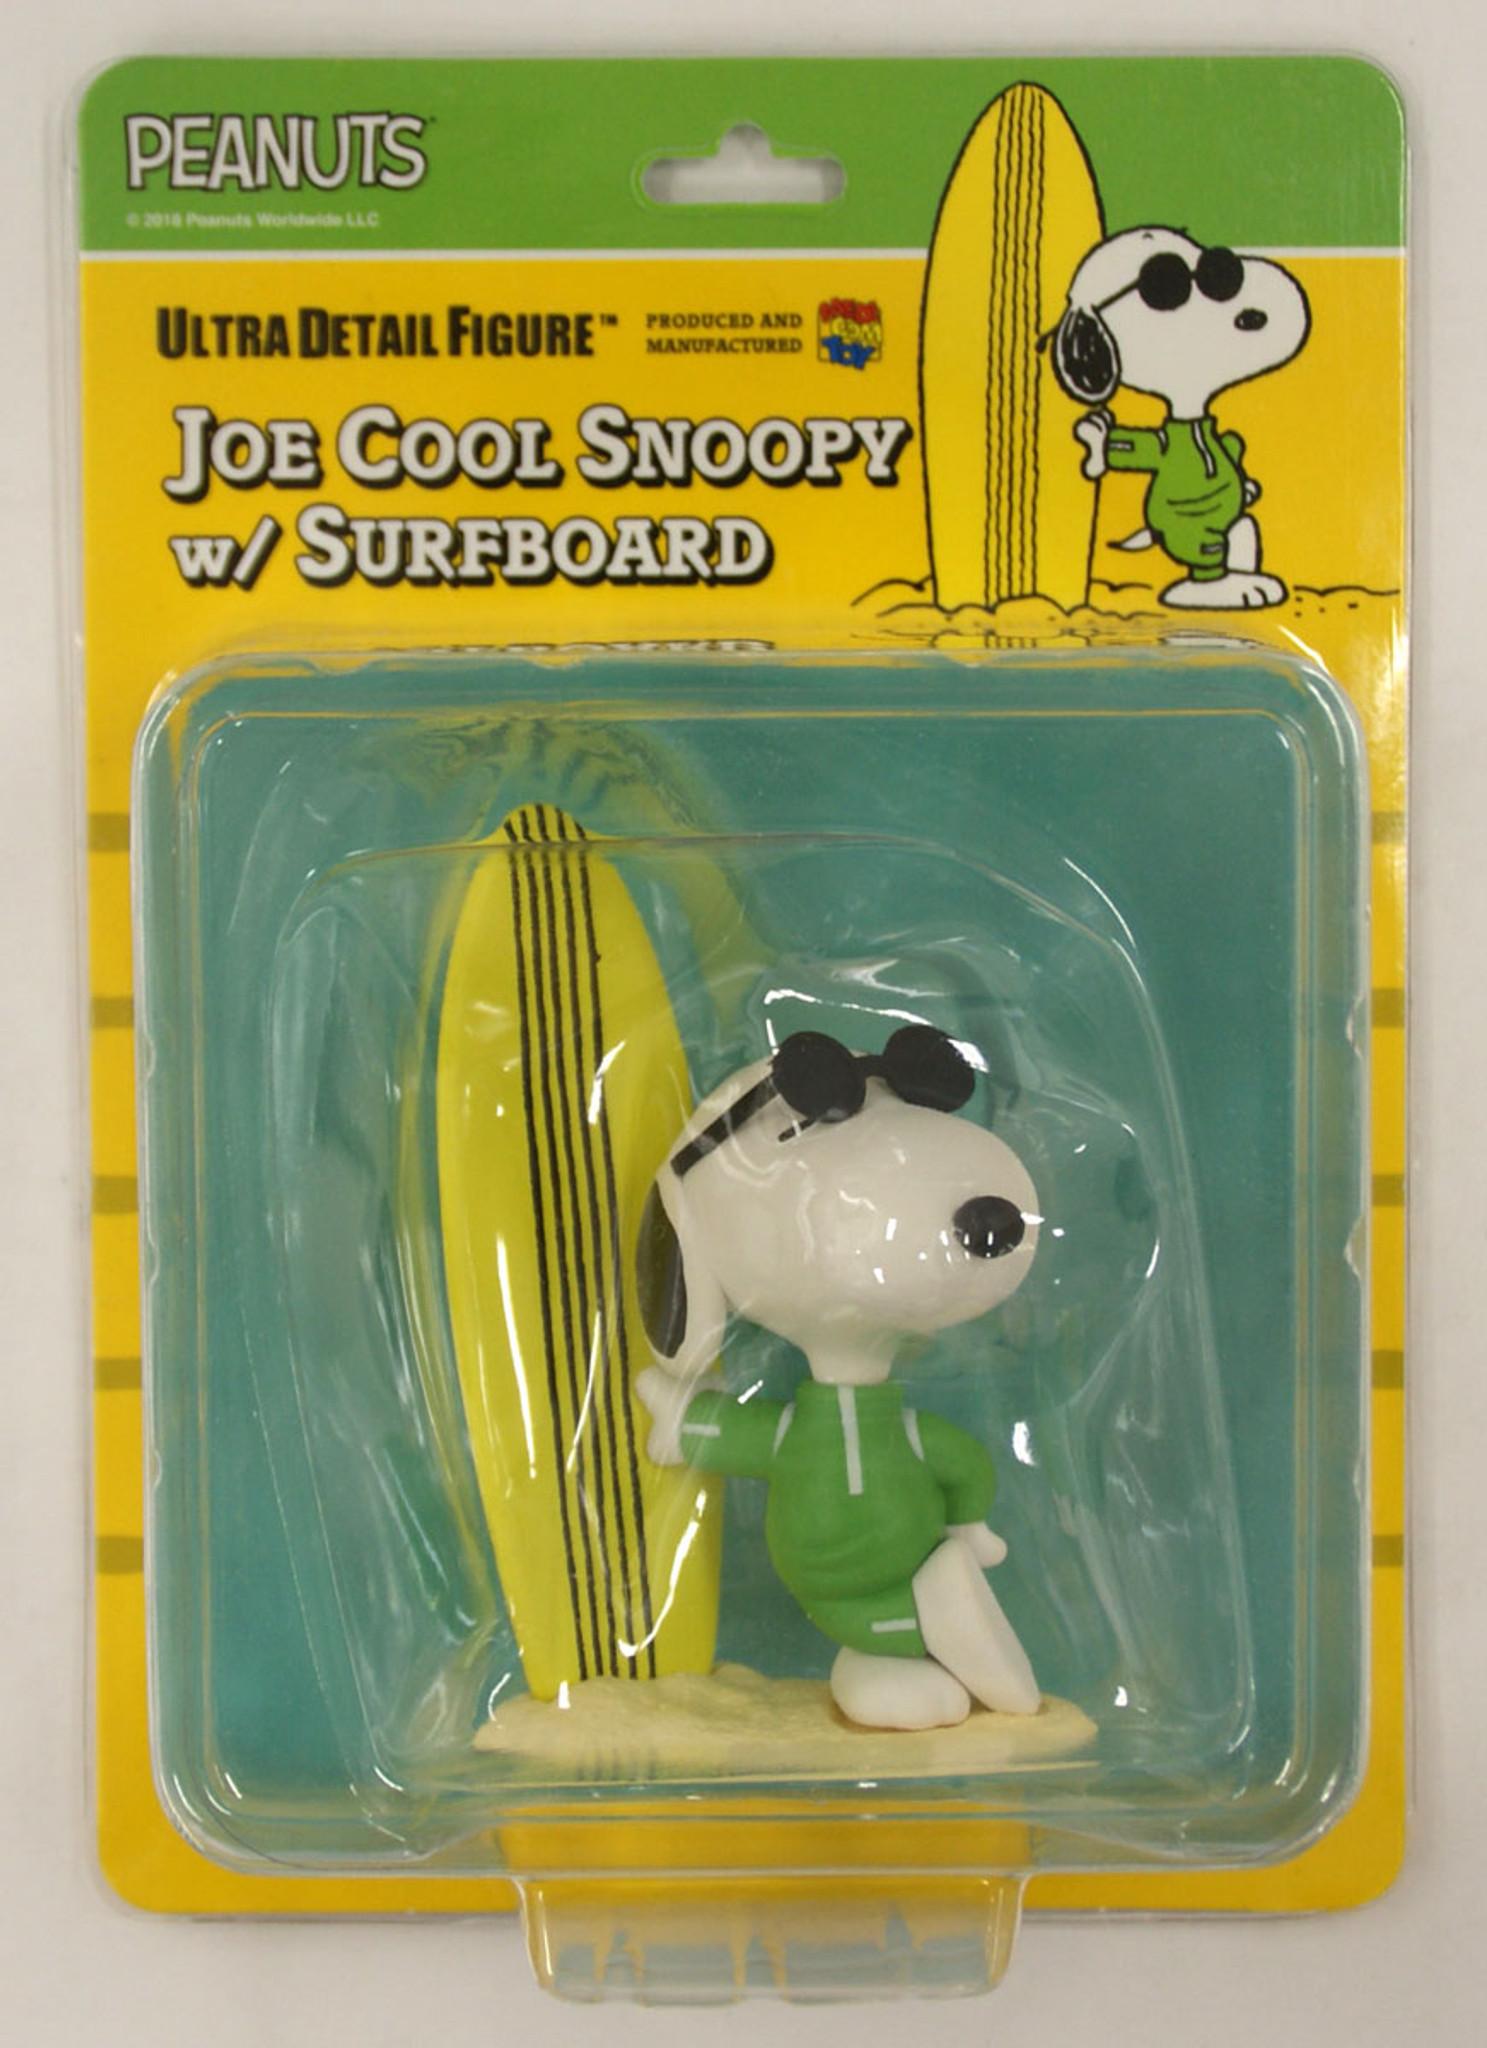 fb440c11a9 Medicom UDF-433 Peanuts Joe Cool Snoopy with Surfboard